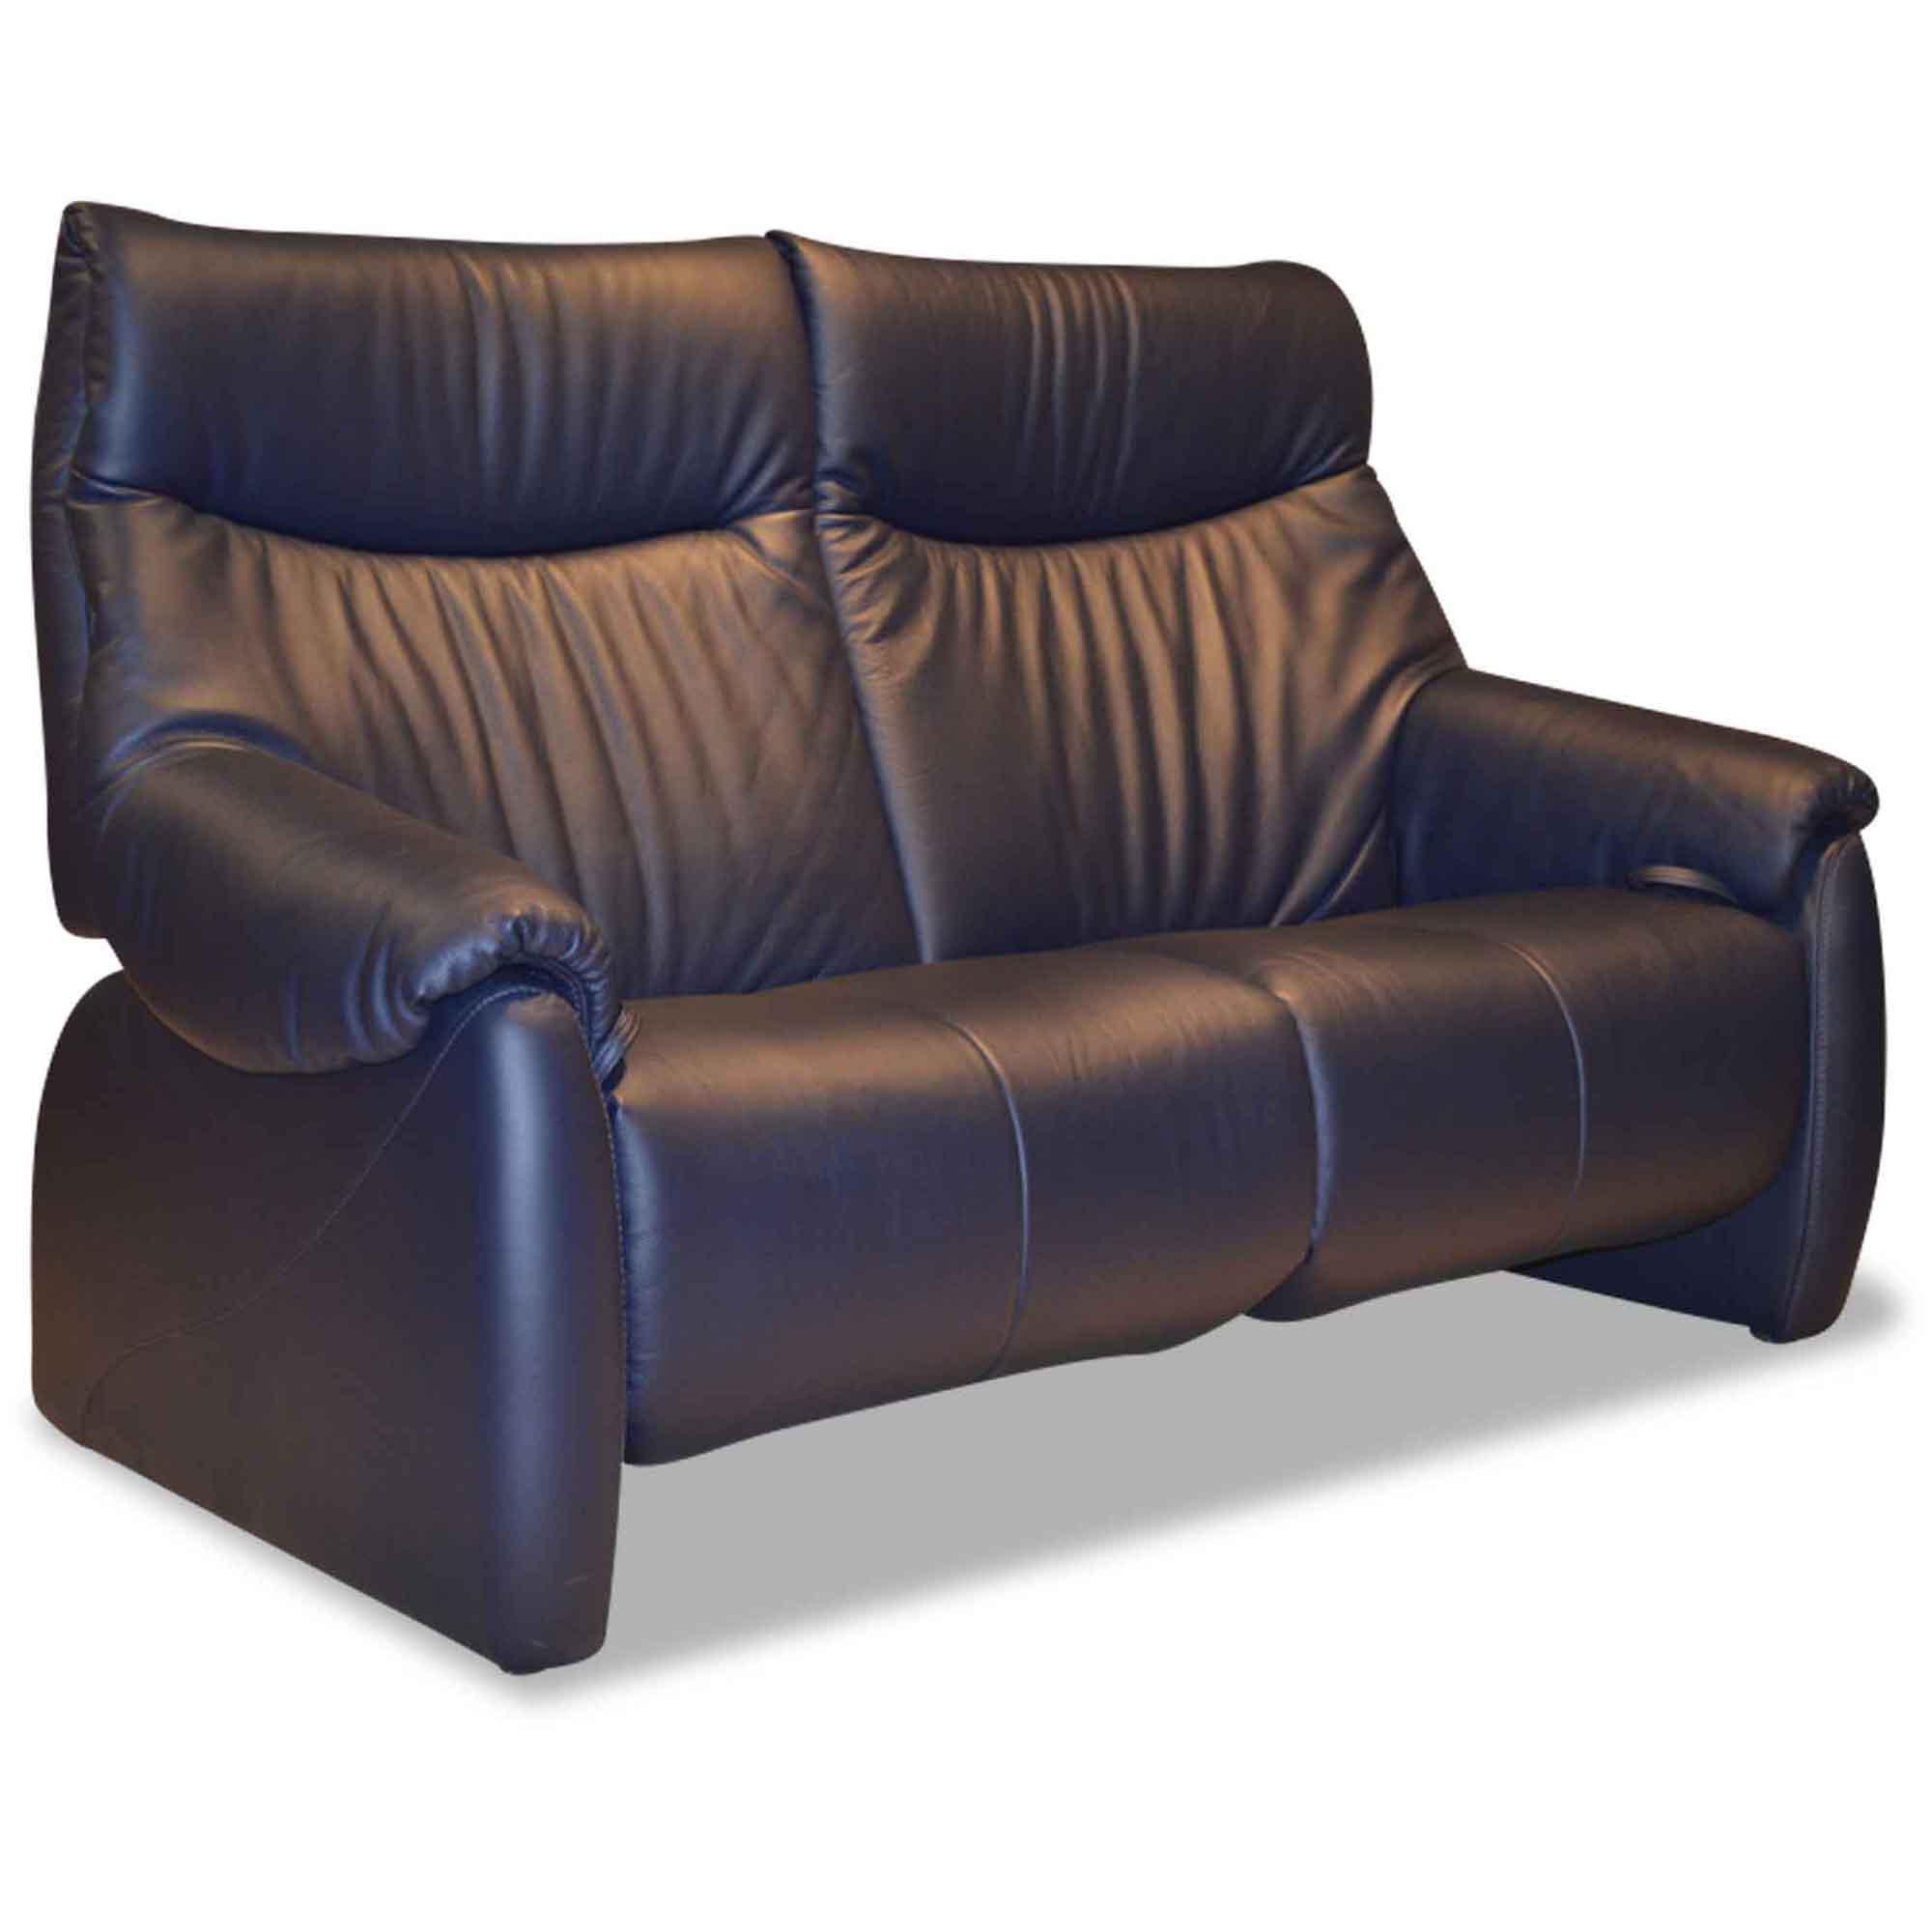 Sofa 4512 11 X44 – Himolla – Sofas – günstig kaufen ...